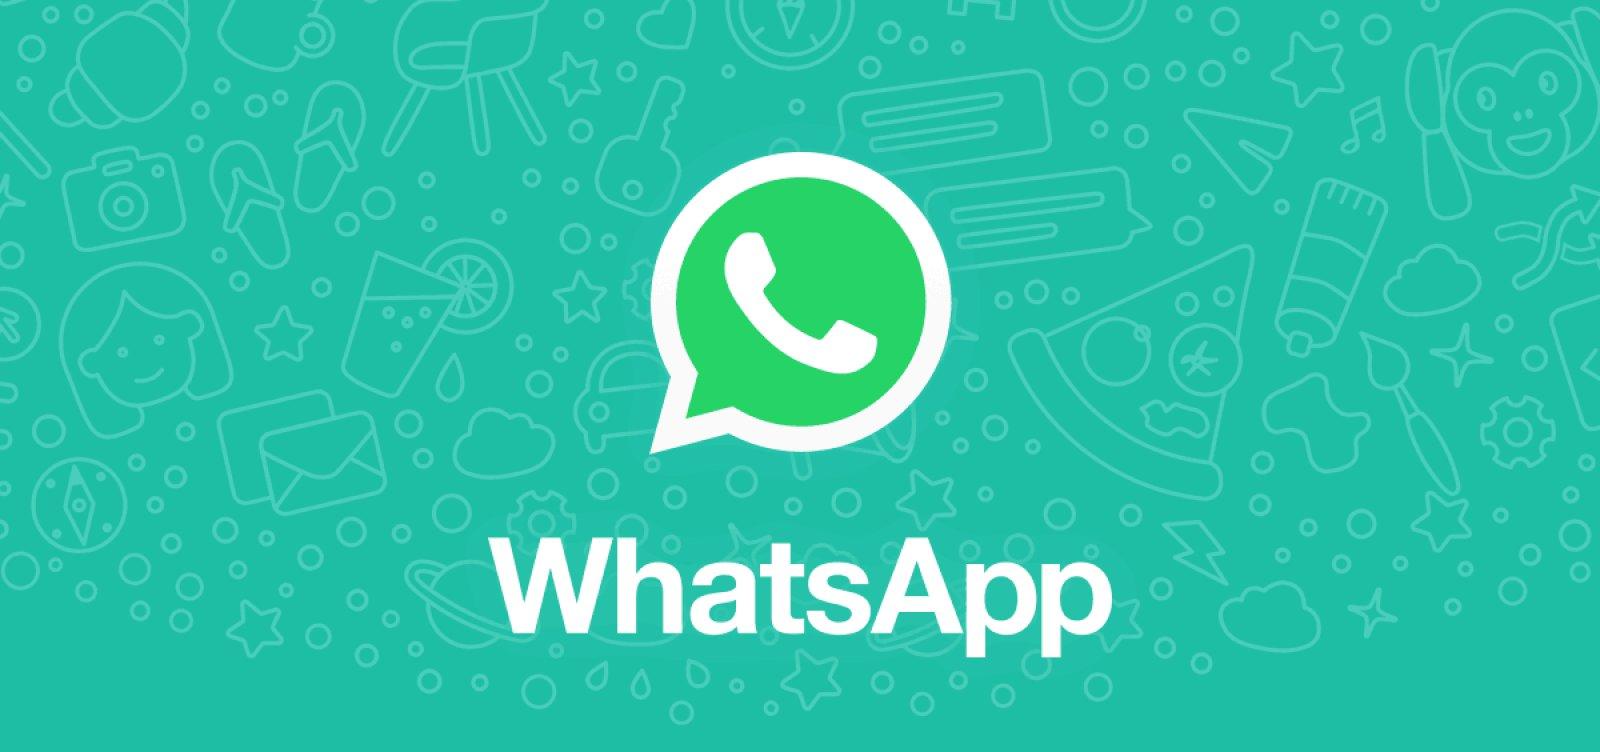 [WhatsApp apresenta problemas de funcionamento neste domingo]